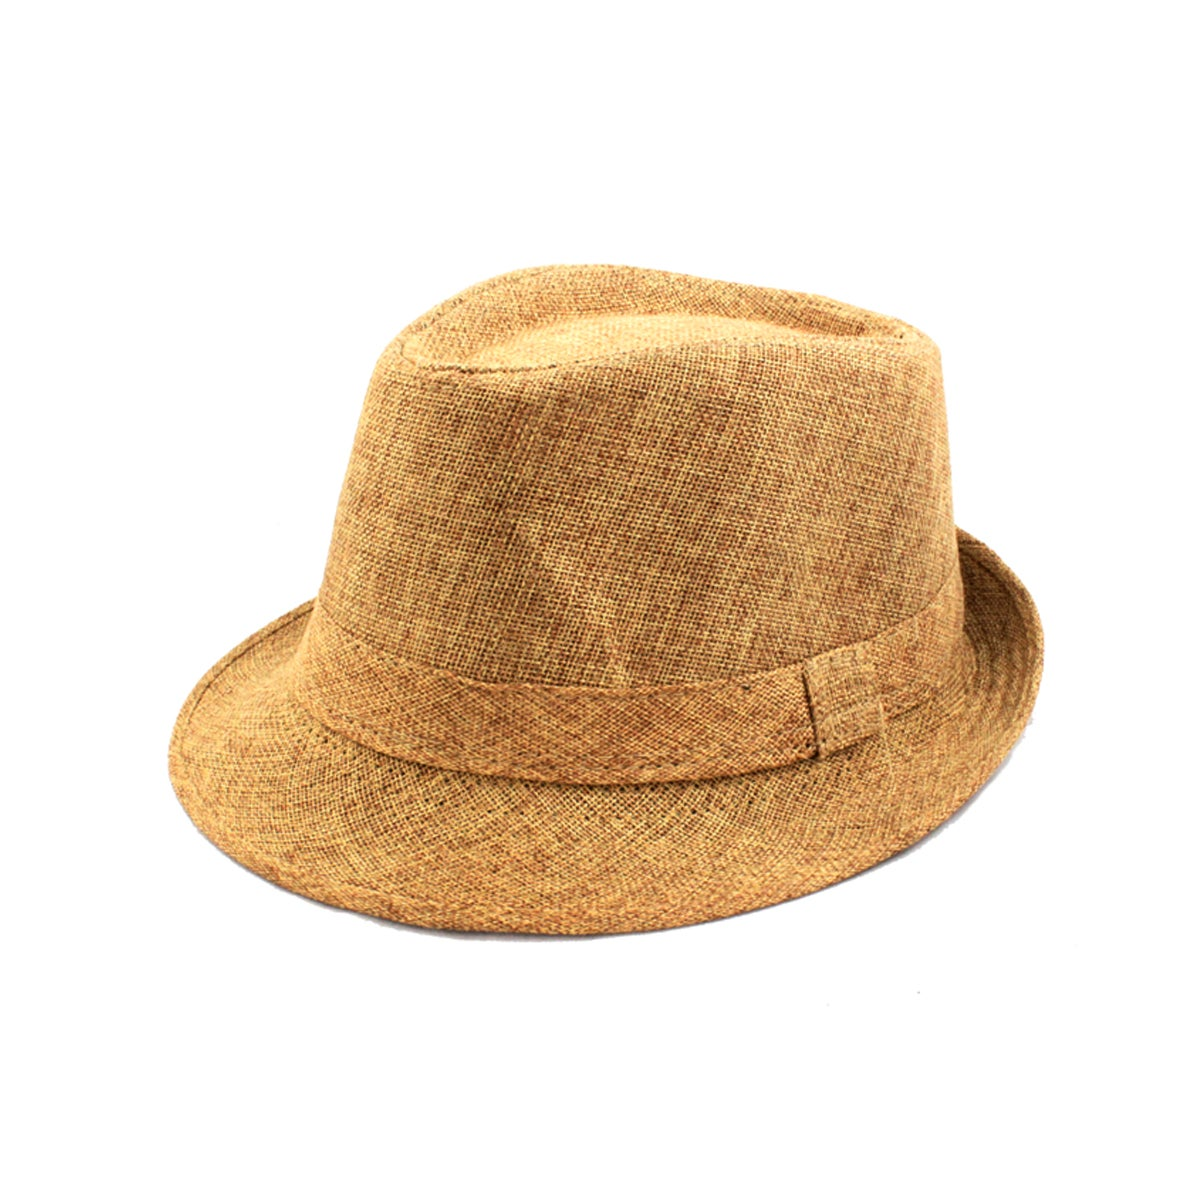 Faddism Beige Stripe Fedora Hat